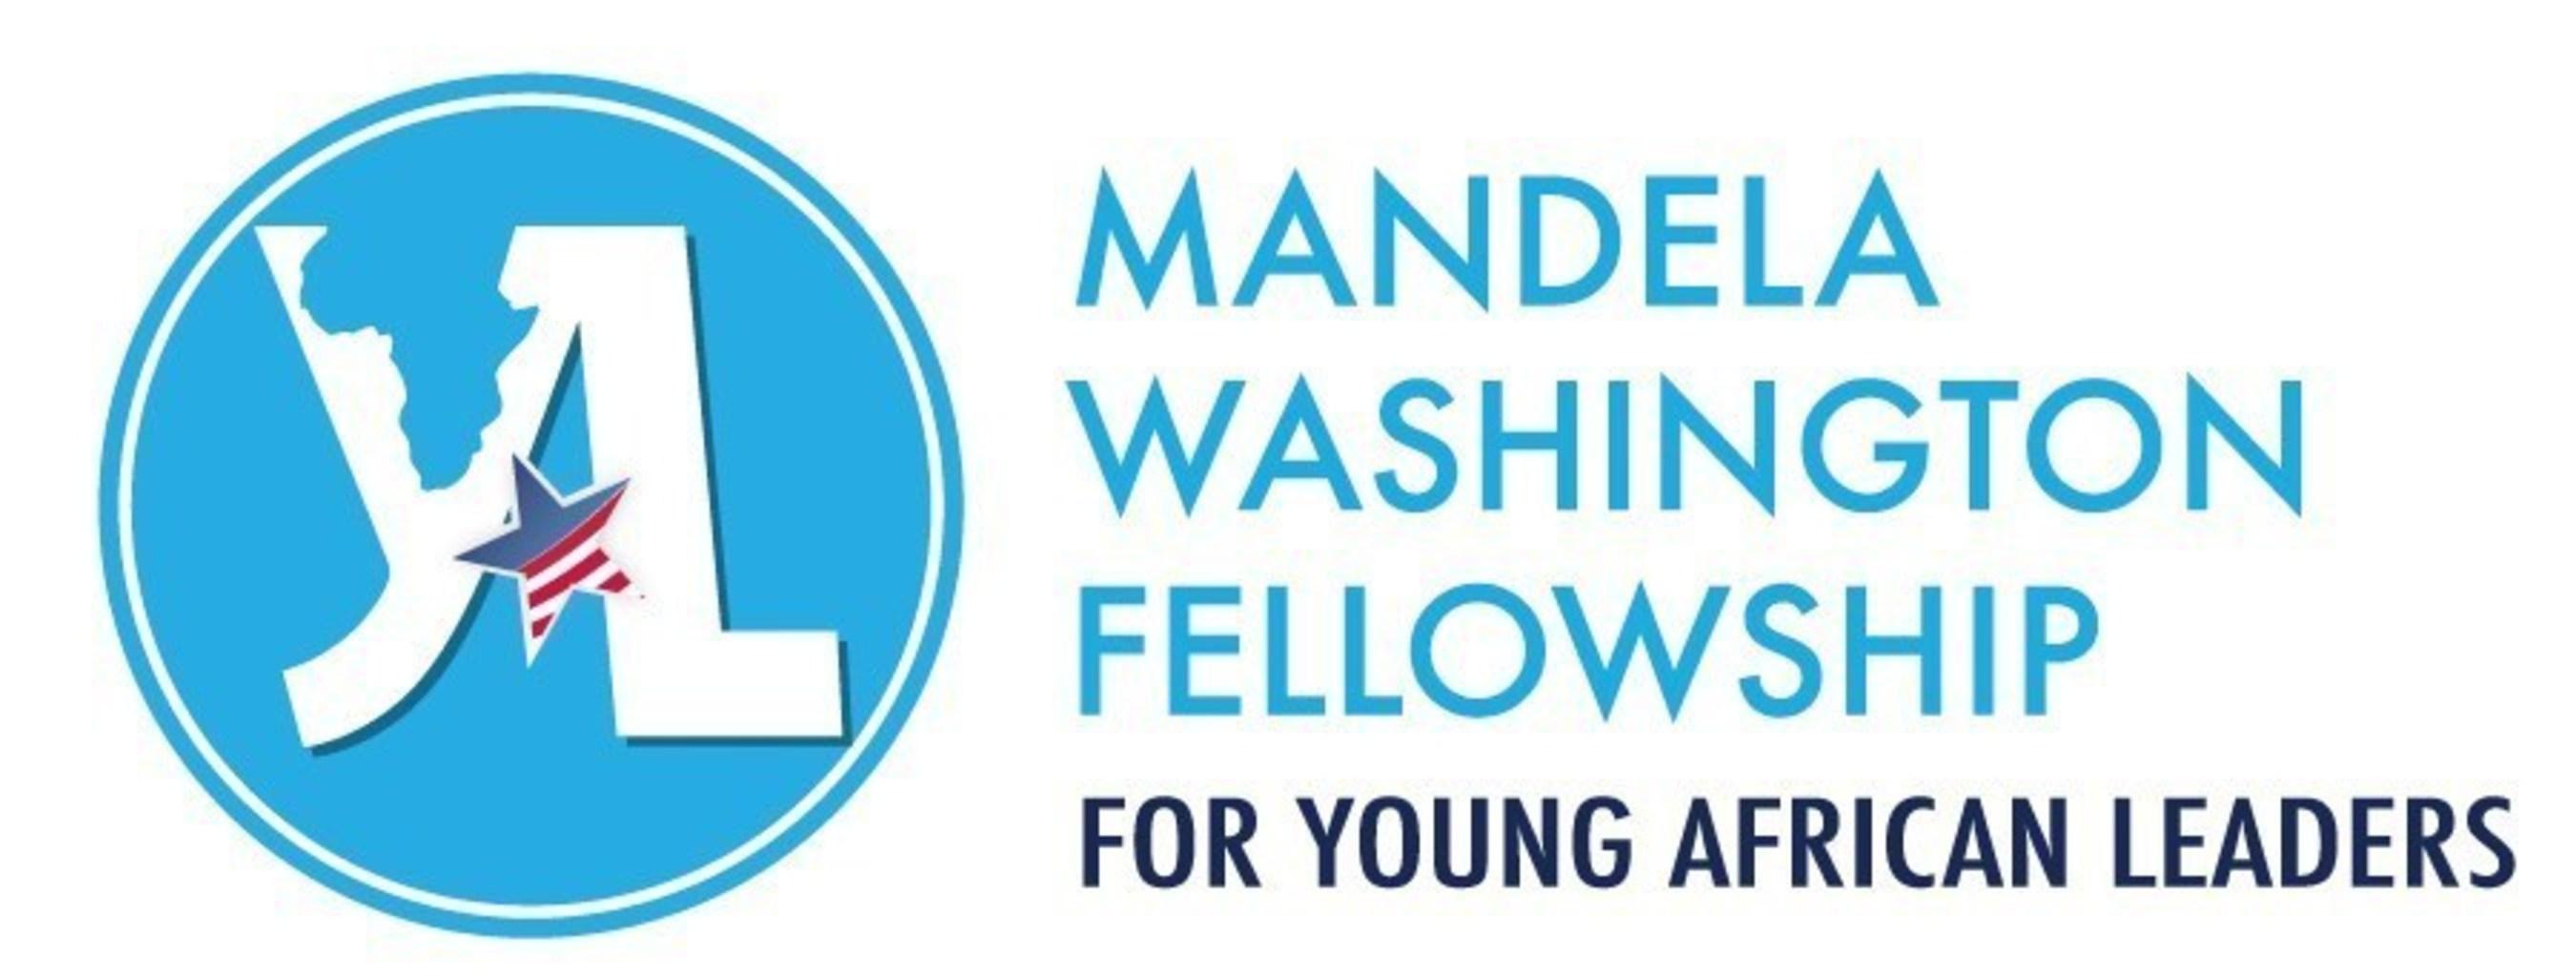 Mandela Washington Fellowship for Young African Leaders logo